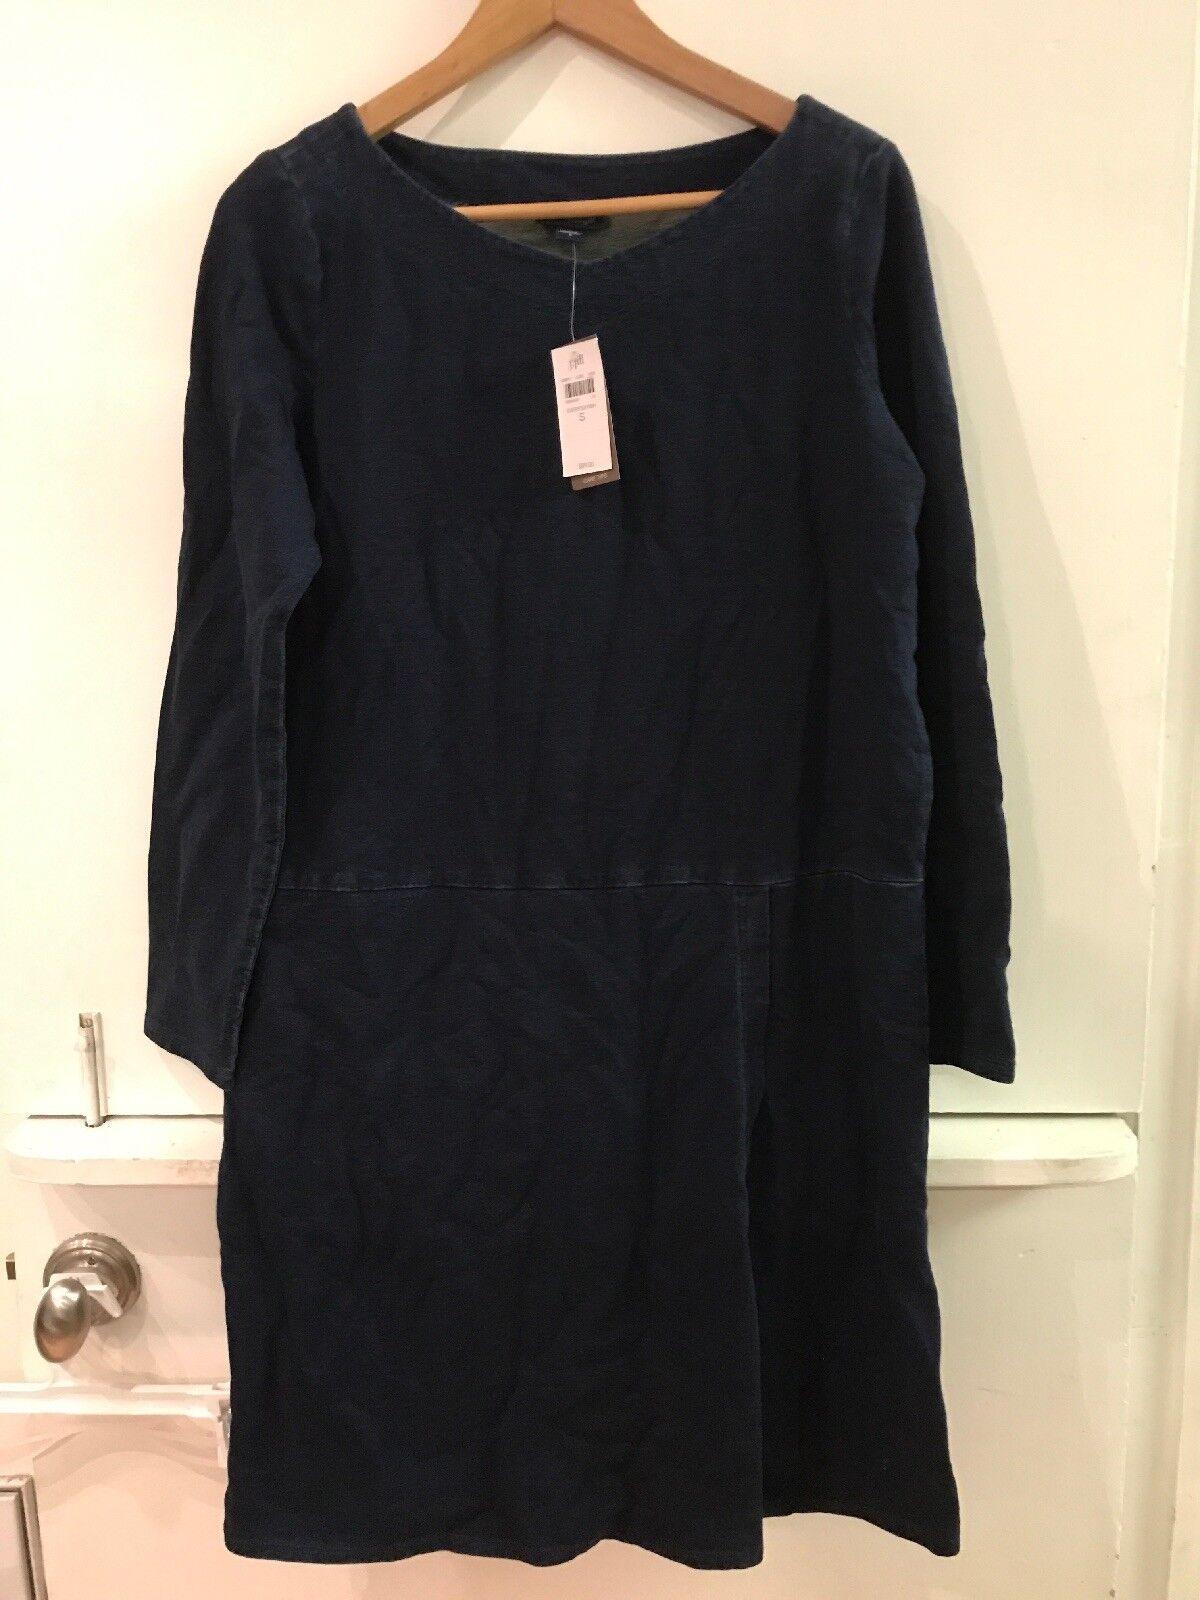 J. Jill Pure Jill Indigo Denim color Dress Faux Wrap S Small NWT New